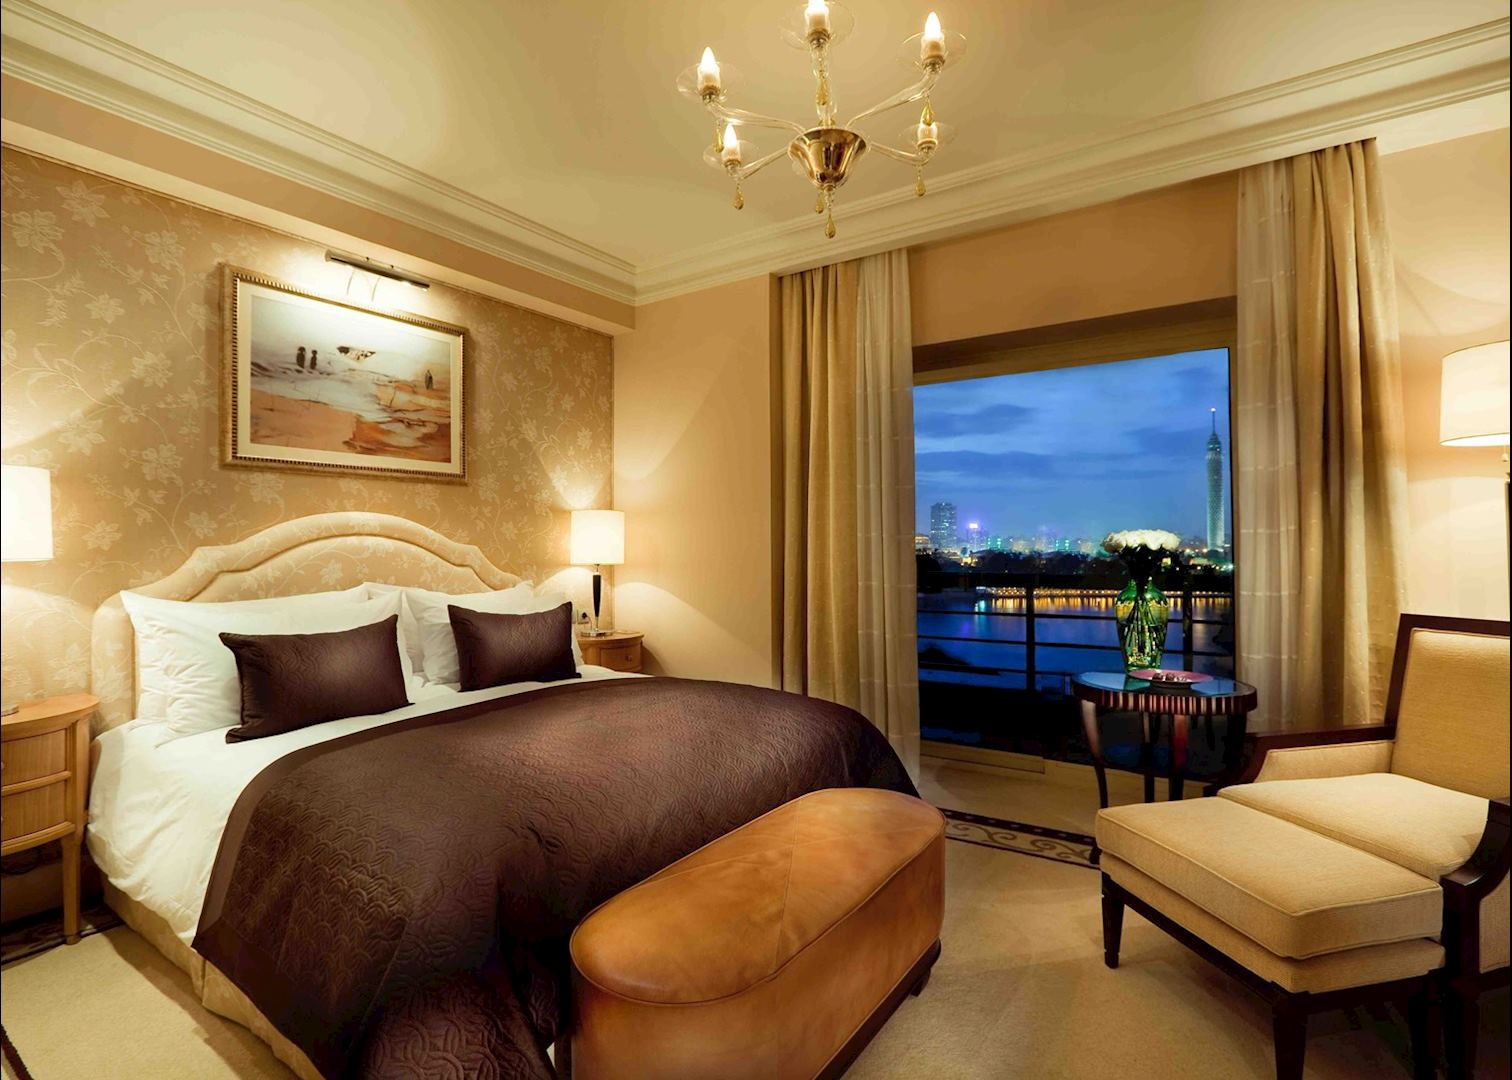 kempinski nile hotel hotels in cairo audley travel. Black Bedroom Furniture Sets. Home Design Ideas